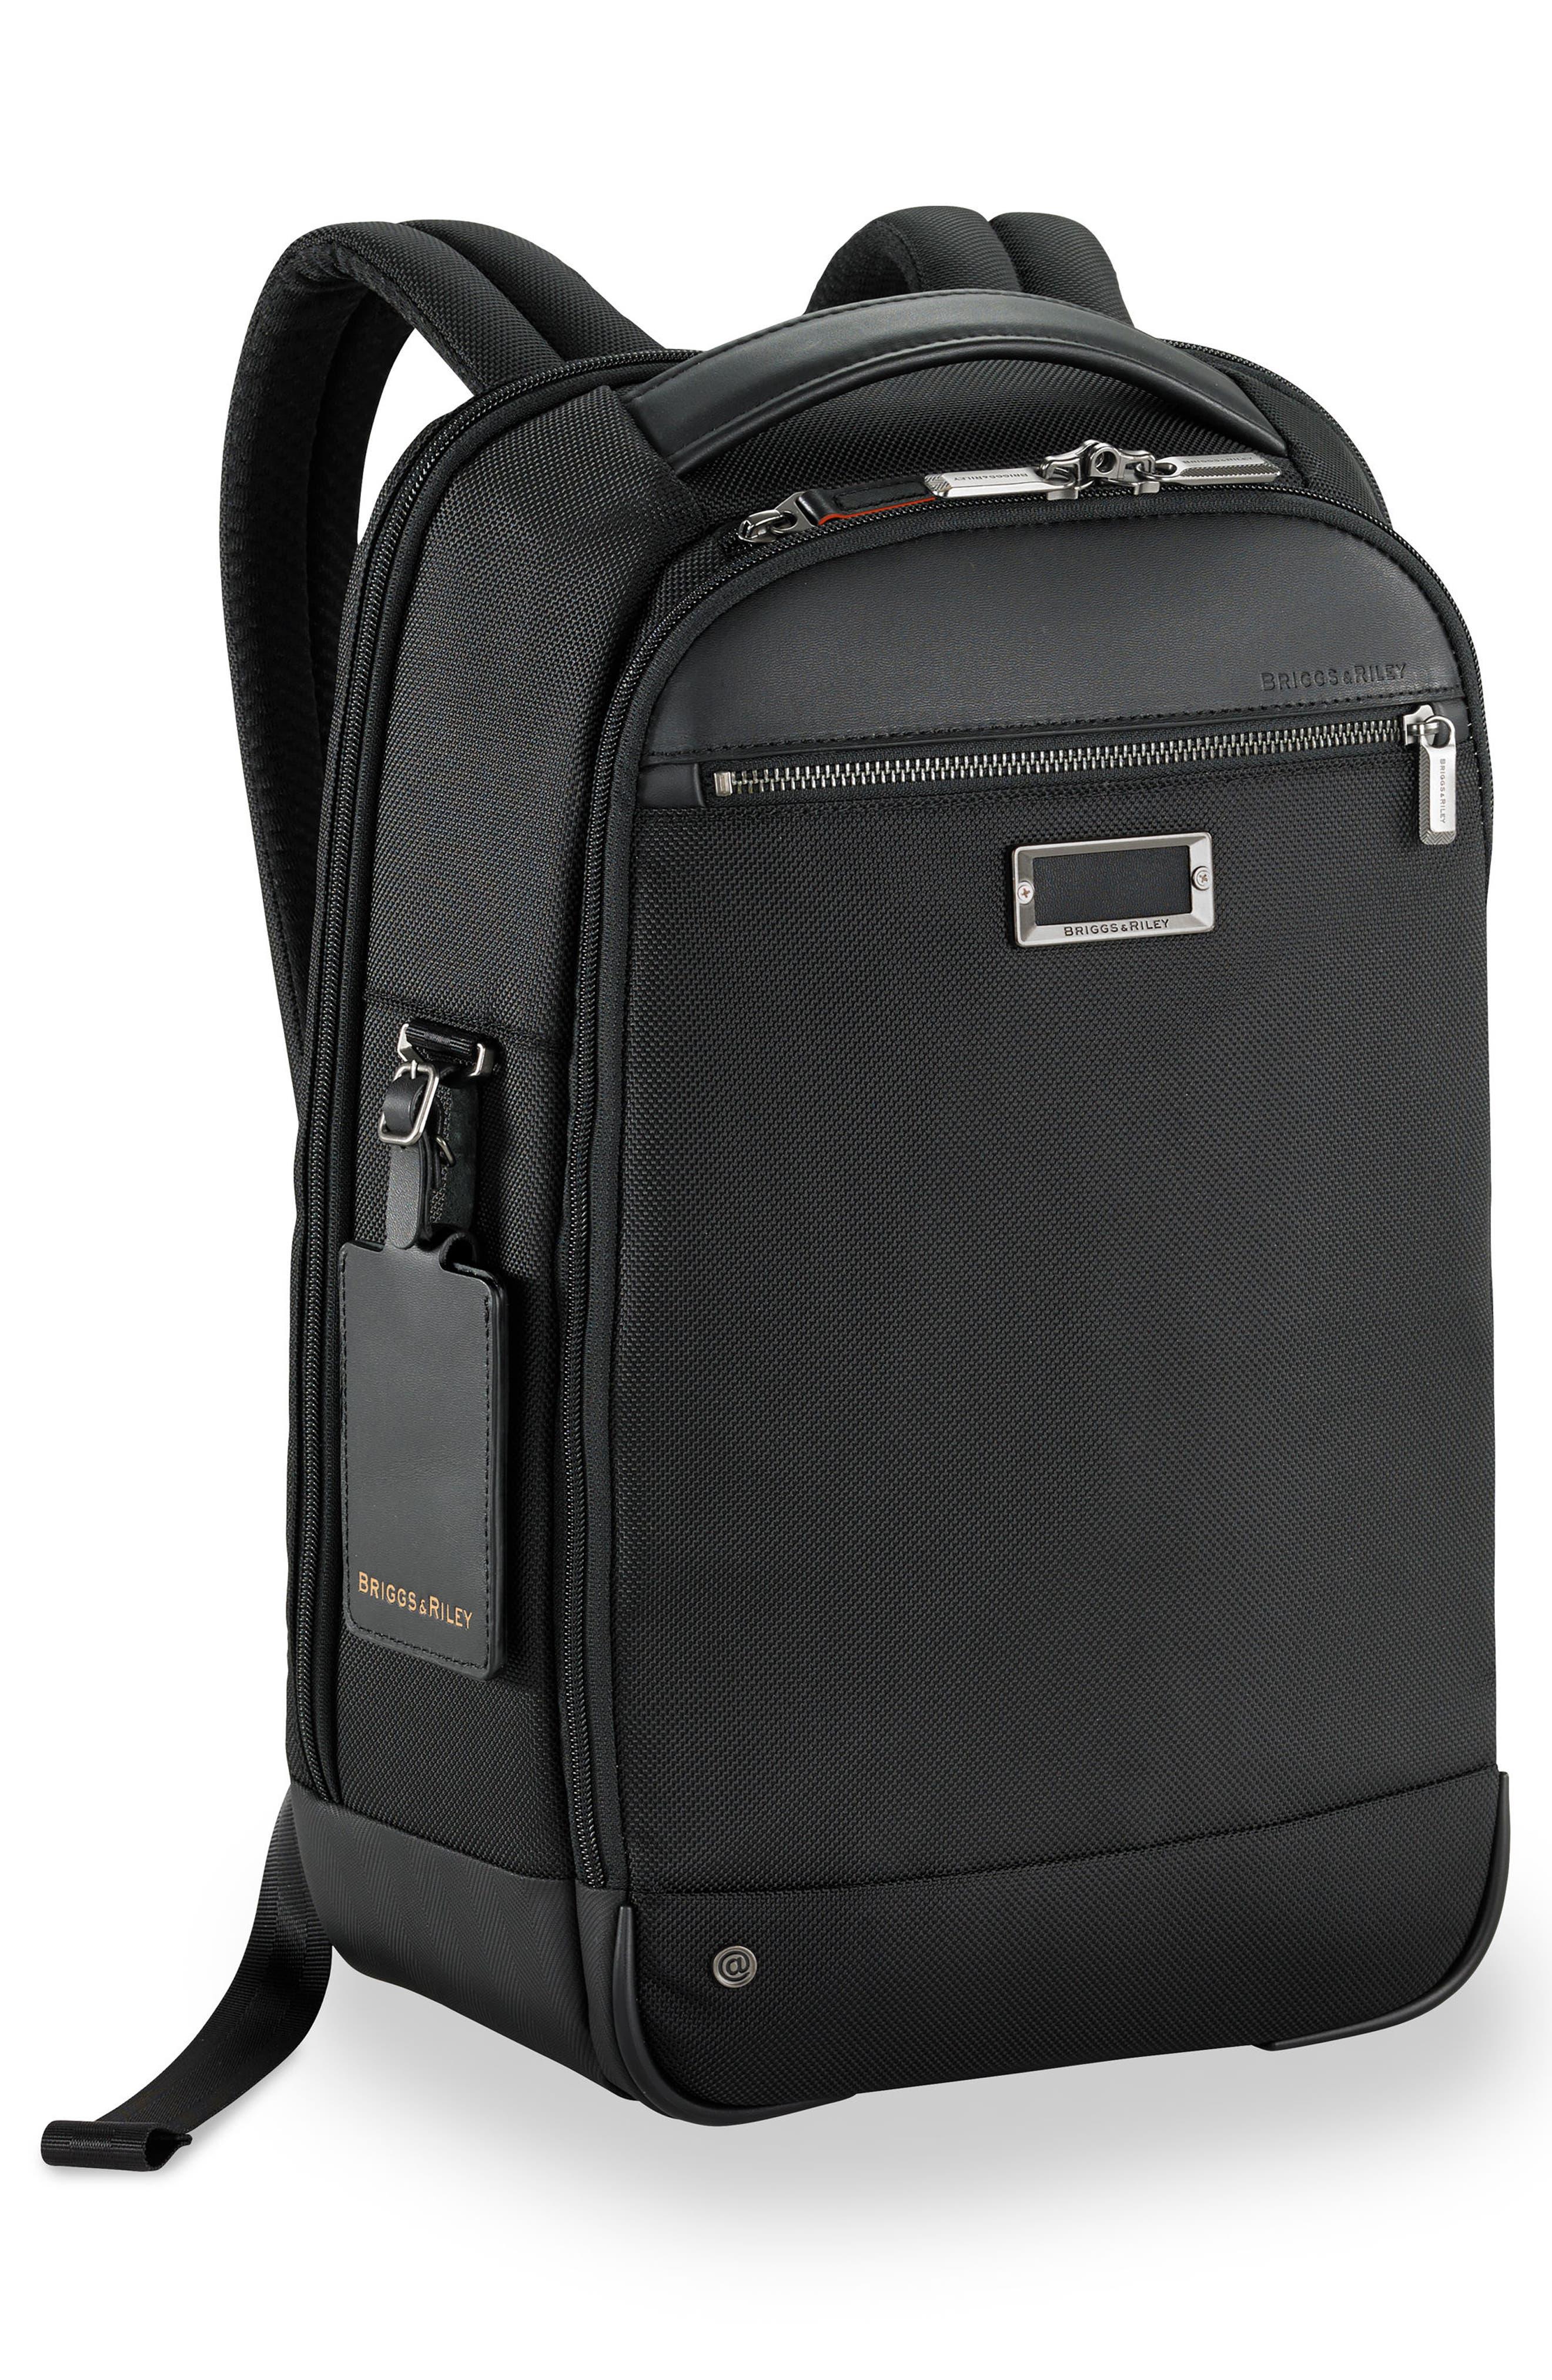 BRIGGS & RILEY,                             @work Medium Slim Backpack,                             Alternate thumbnail 3, color,                             NO_COLOR